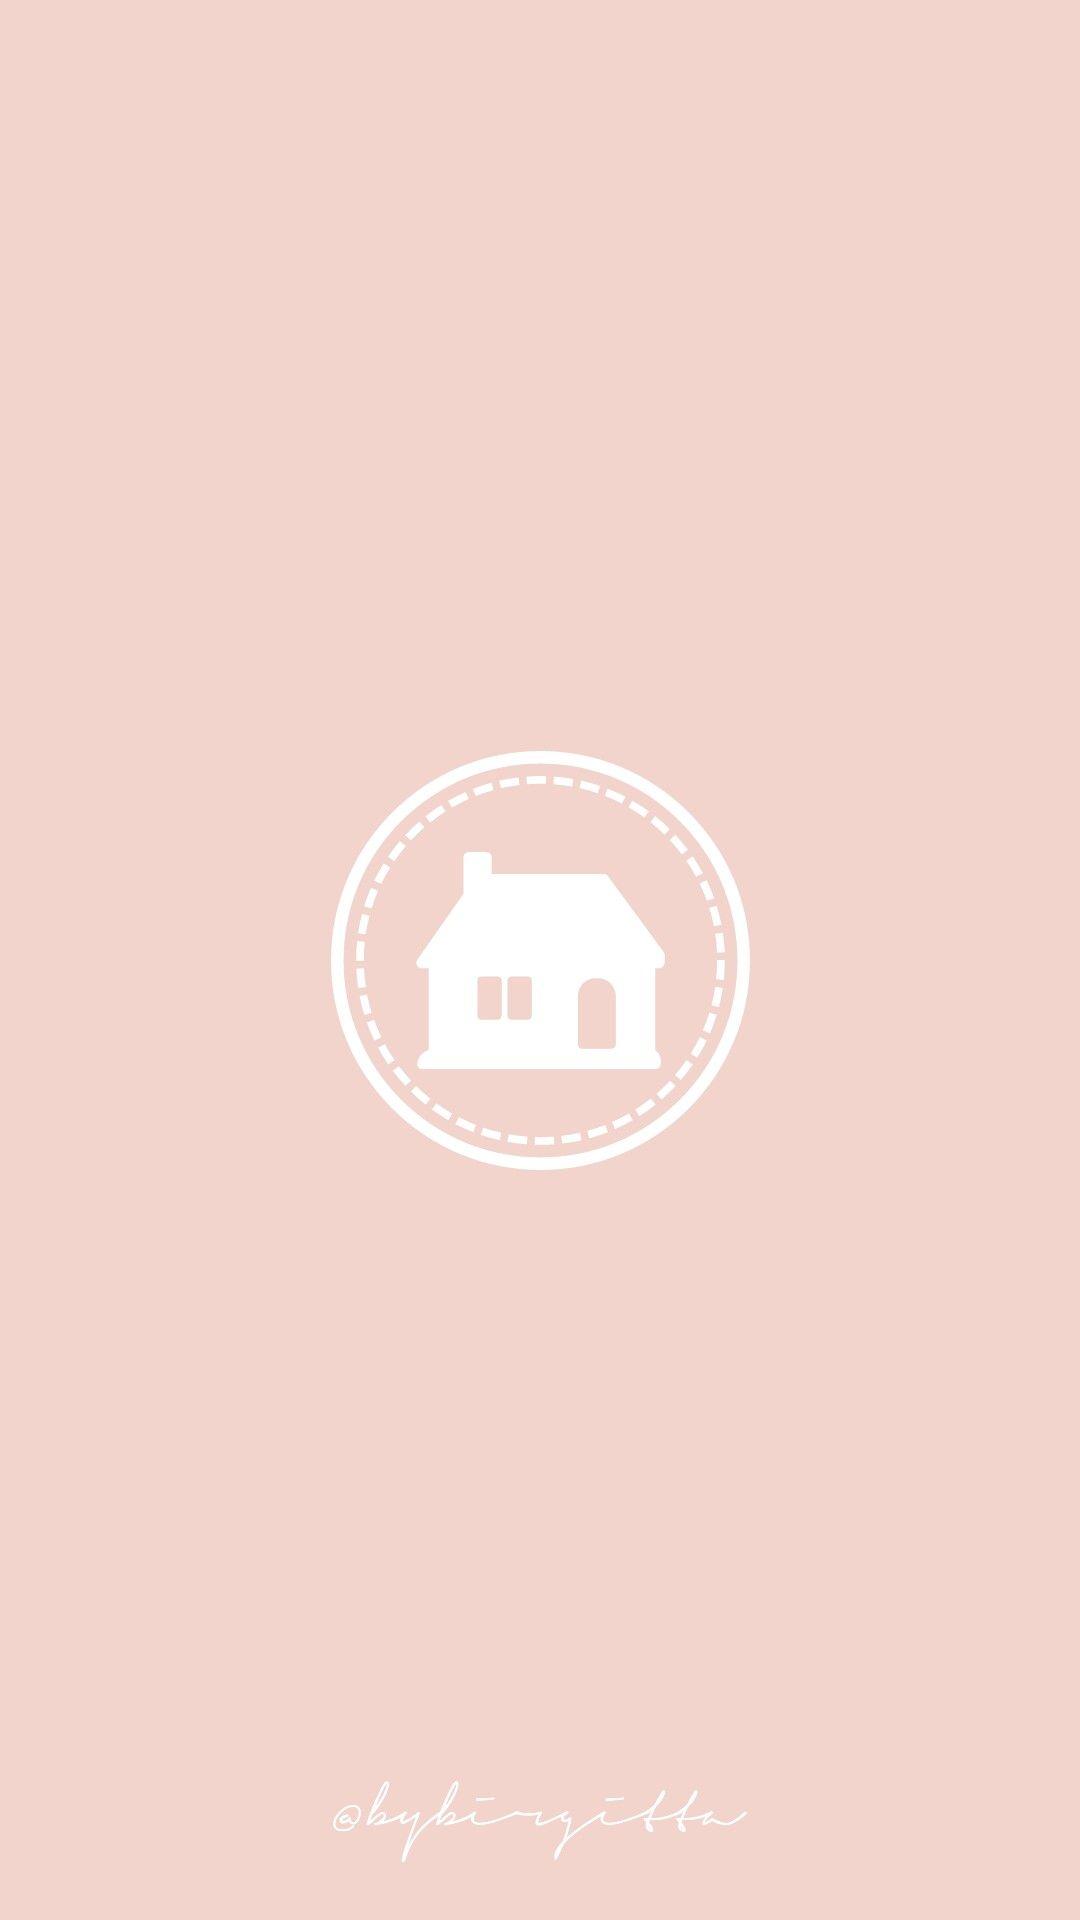 Instagram Highlights Cover Pink Edition Instagram Kruglaya Kartina Logotip Fotografa